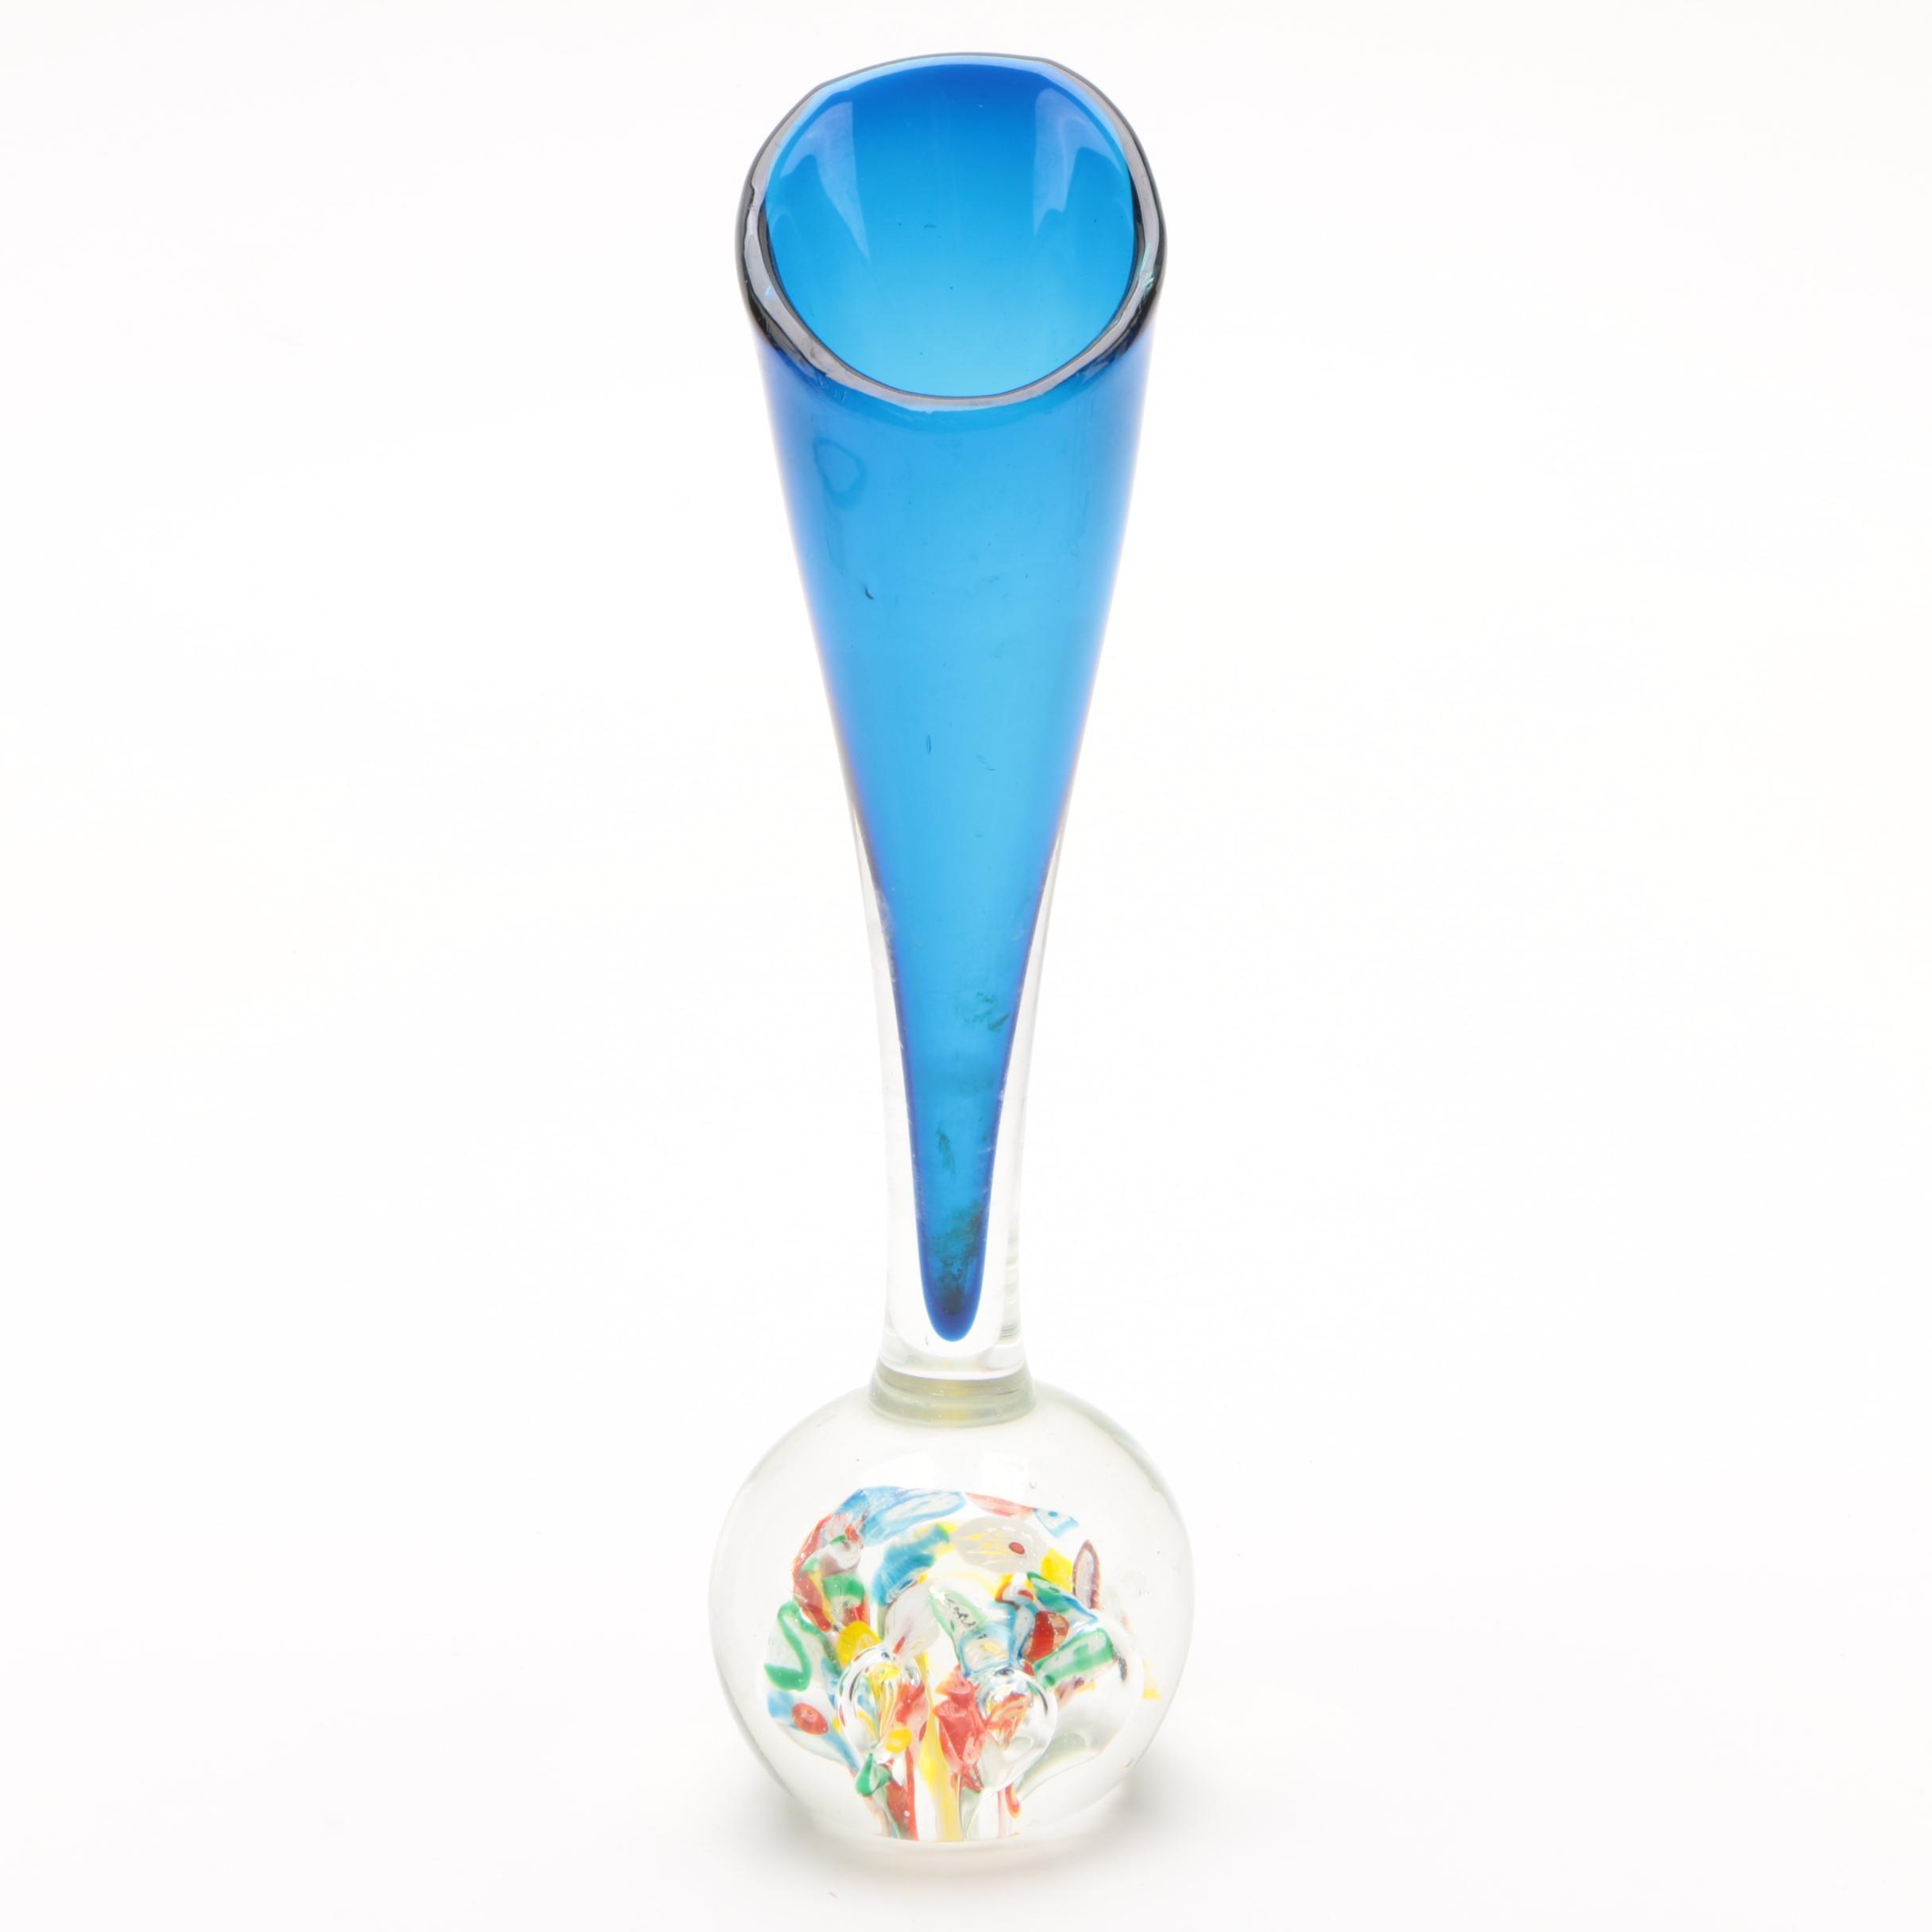 Art Glass Paperweight Vase